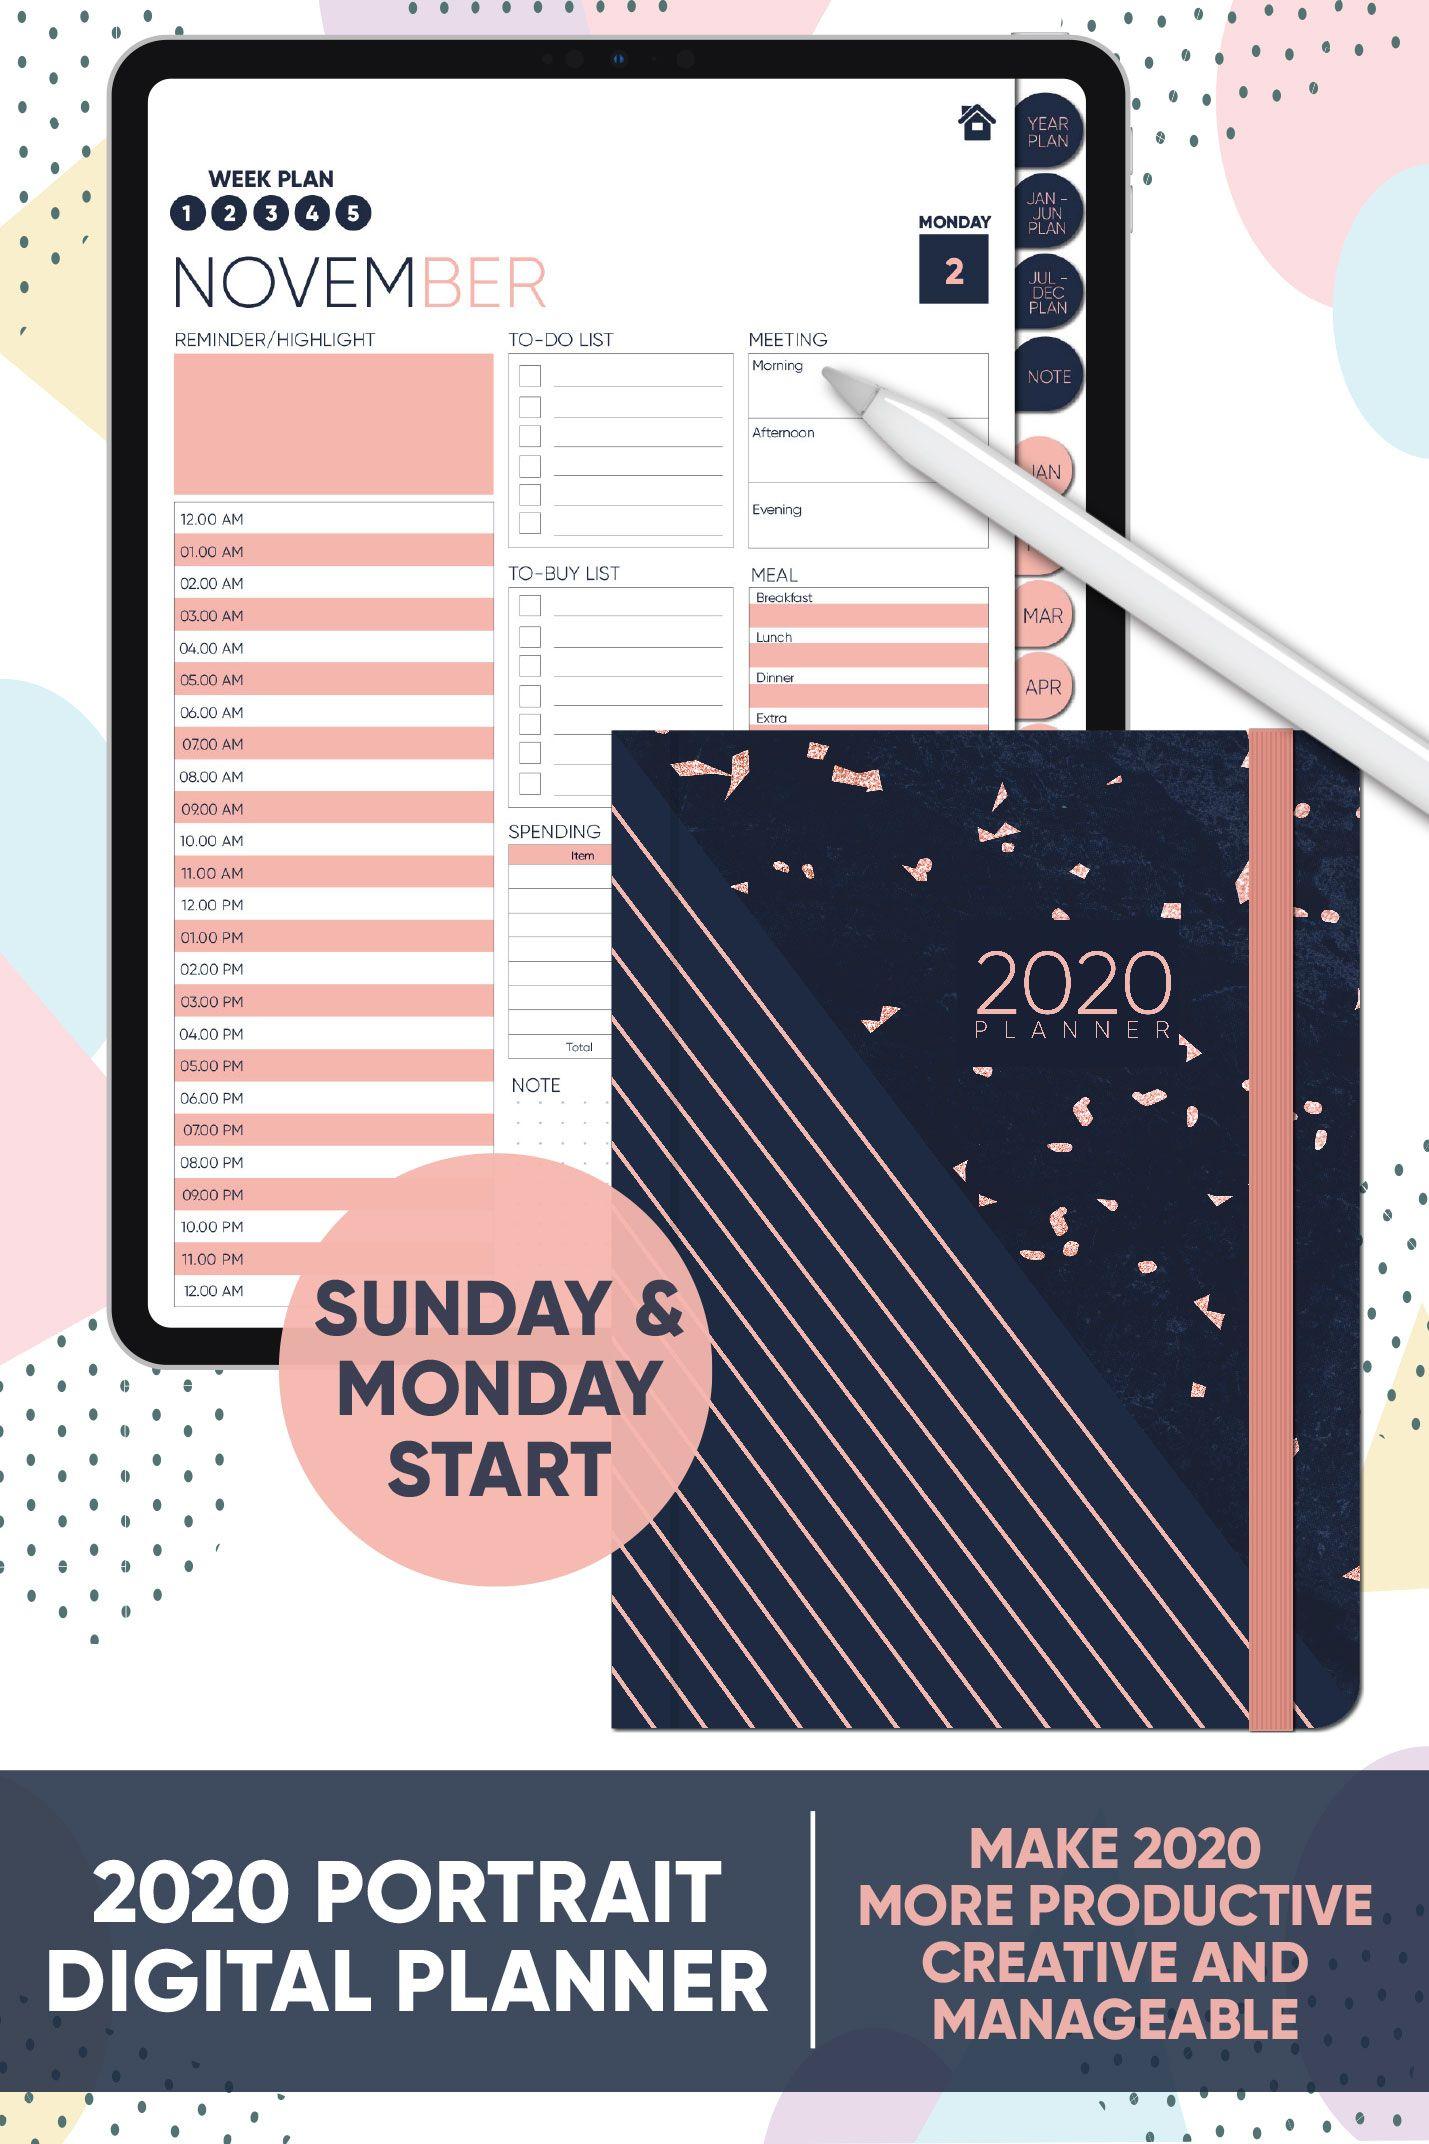 2020 Portrait Planner Digital In 2020 Digital Planner Planner Digital Sticker